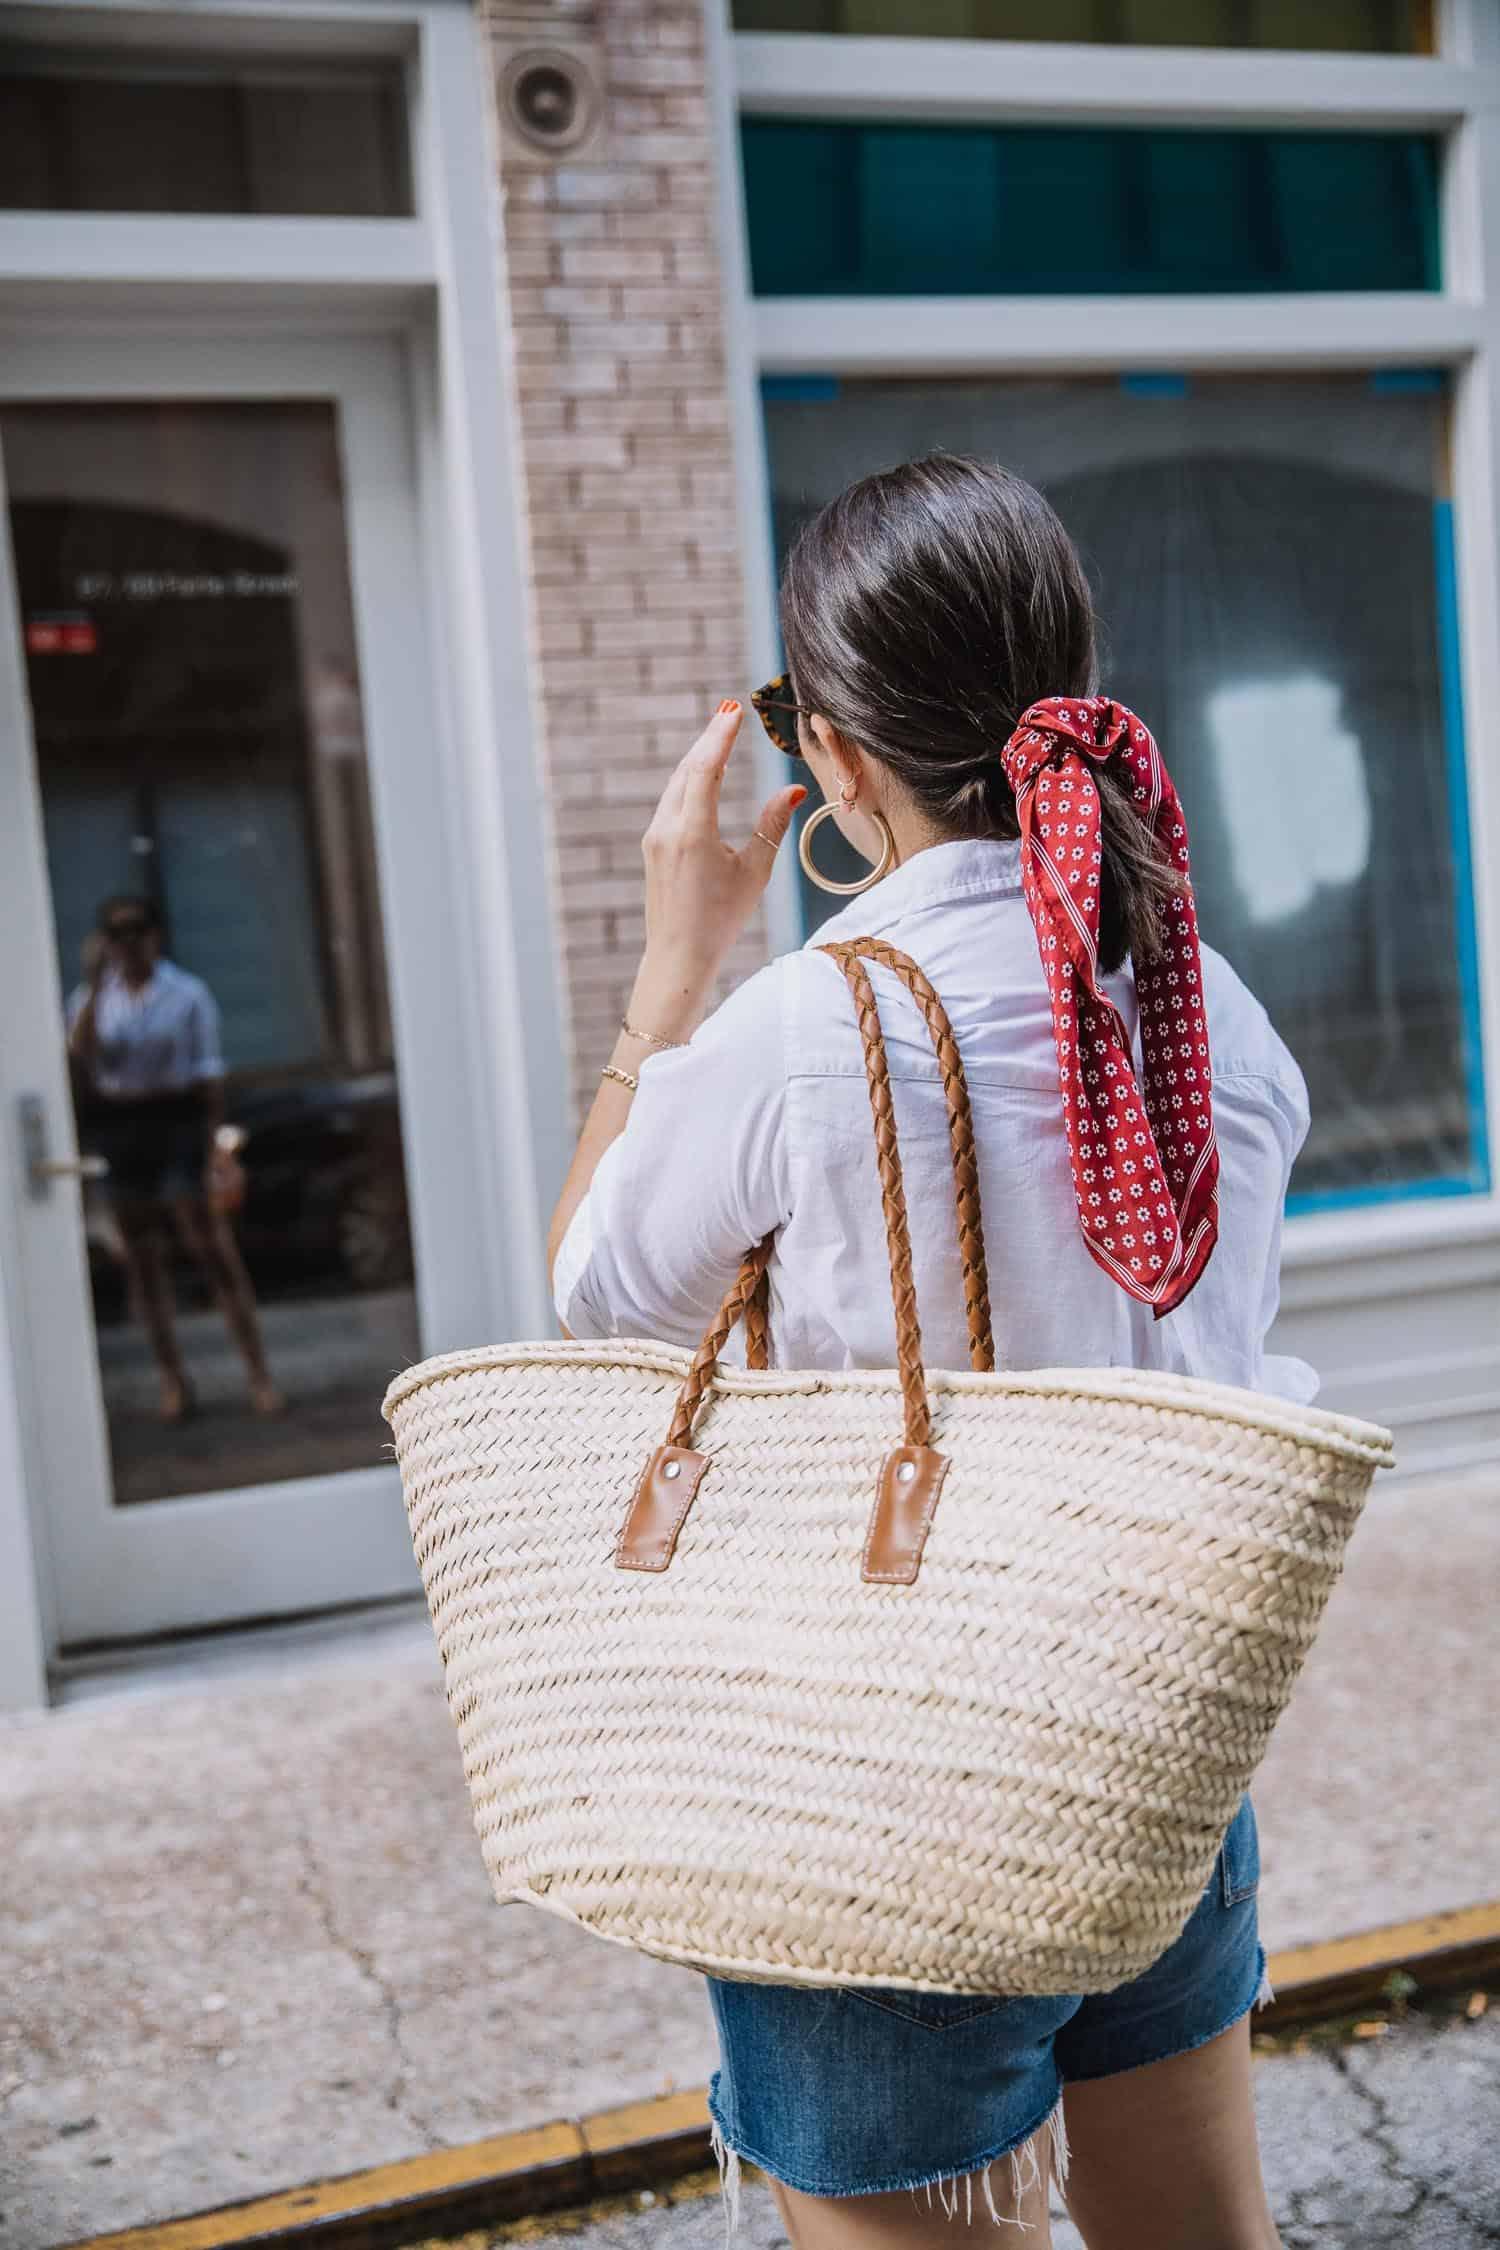 jute tote bag and bandana in ponytail